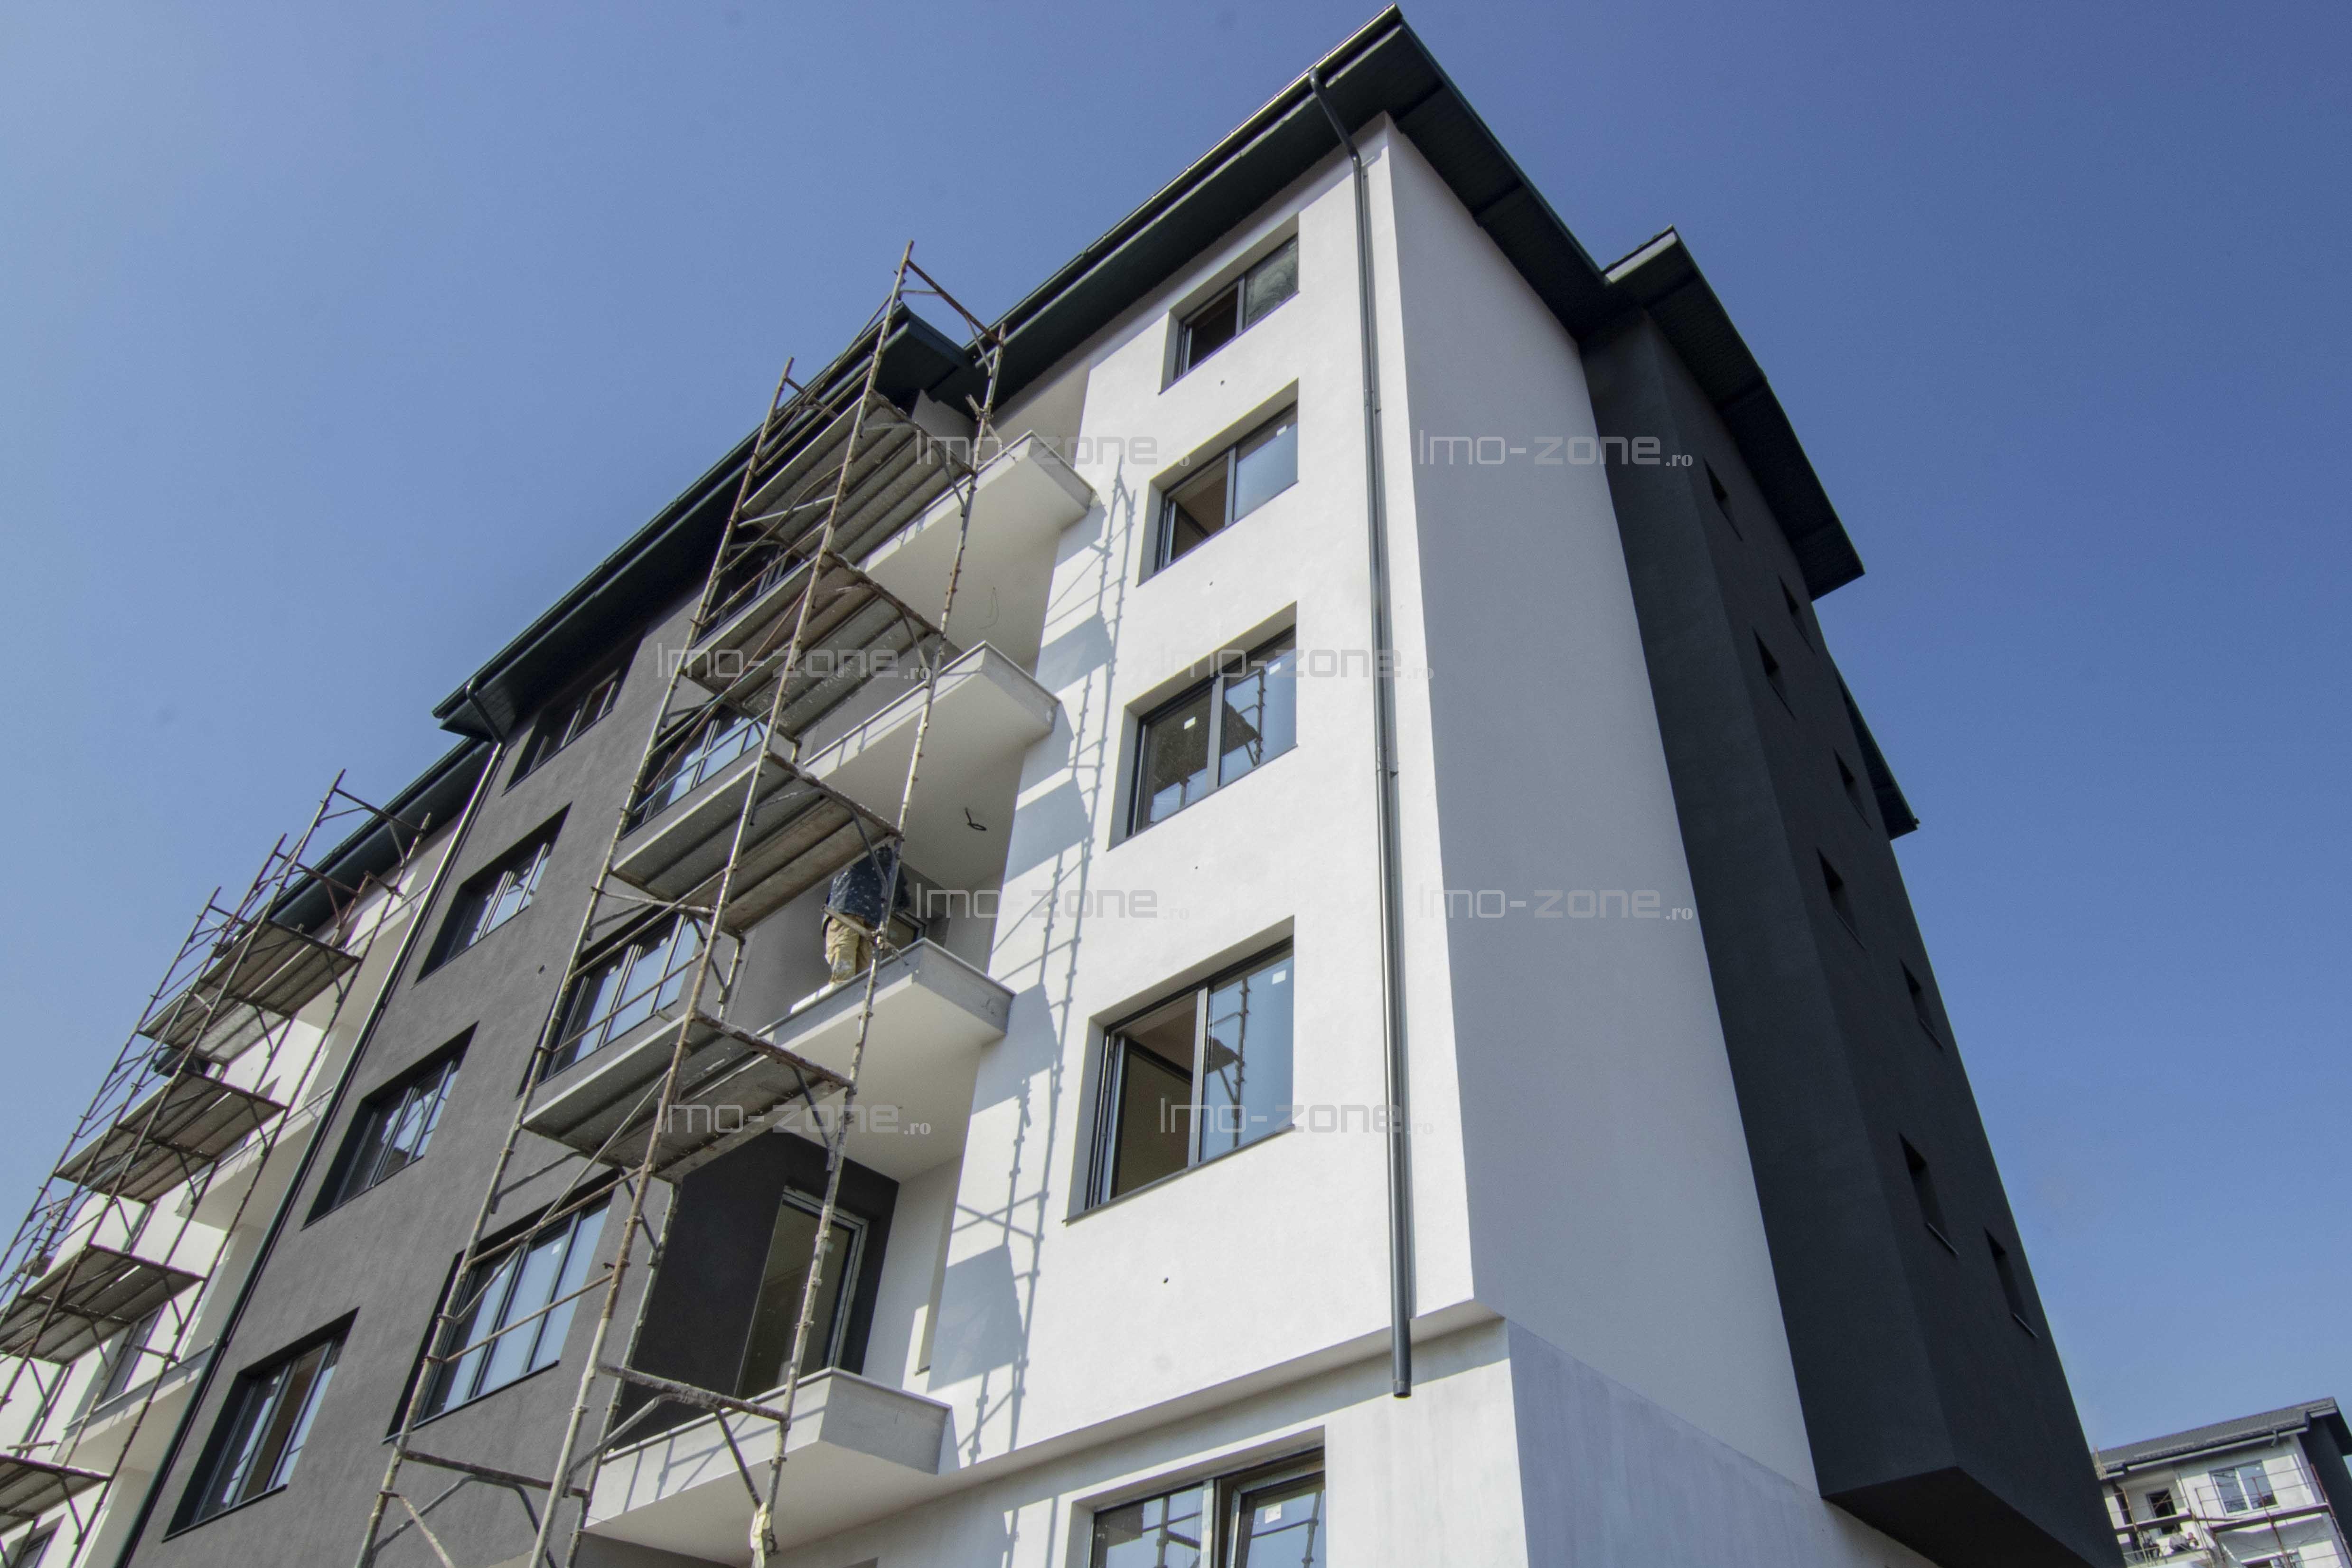 2 CAMERE spatios, 59 mp, balcon 5 mp,  baie cu geam, bucatarie inchisa